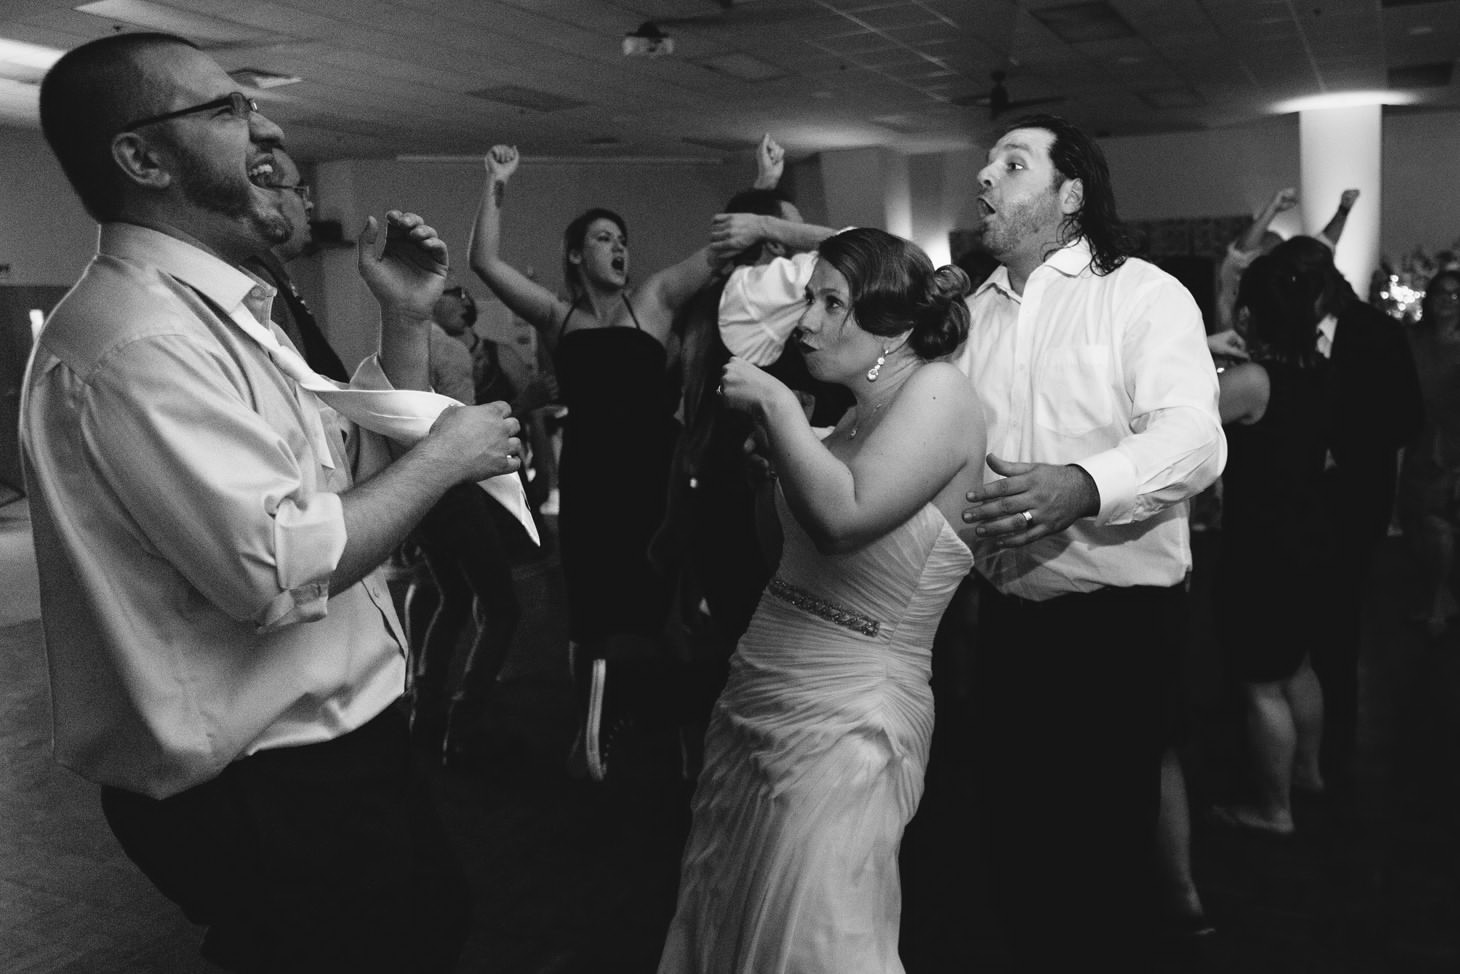 068-nyc-wedding-photographer-nj-nerdy-dr-who-firehouse-wedding-smitten-chickens.jpg